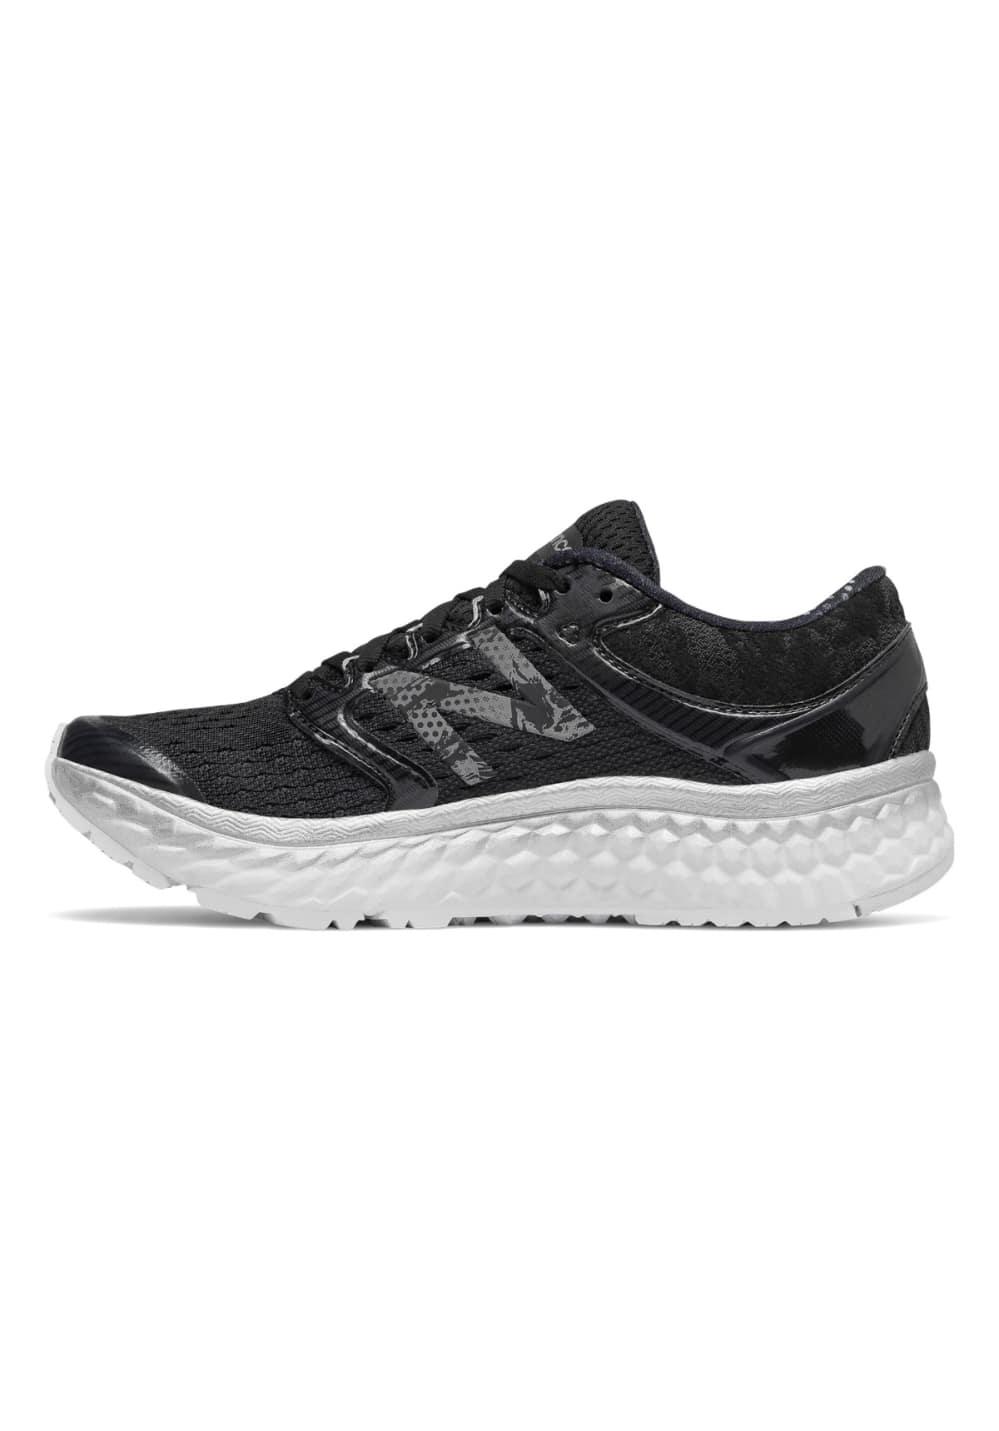 chaussure new balance fresh foam 1080 v7